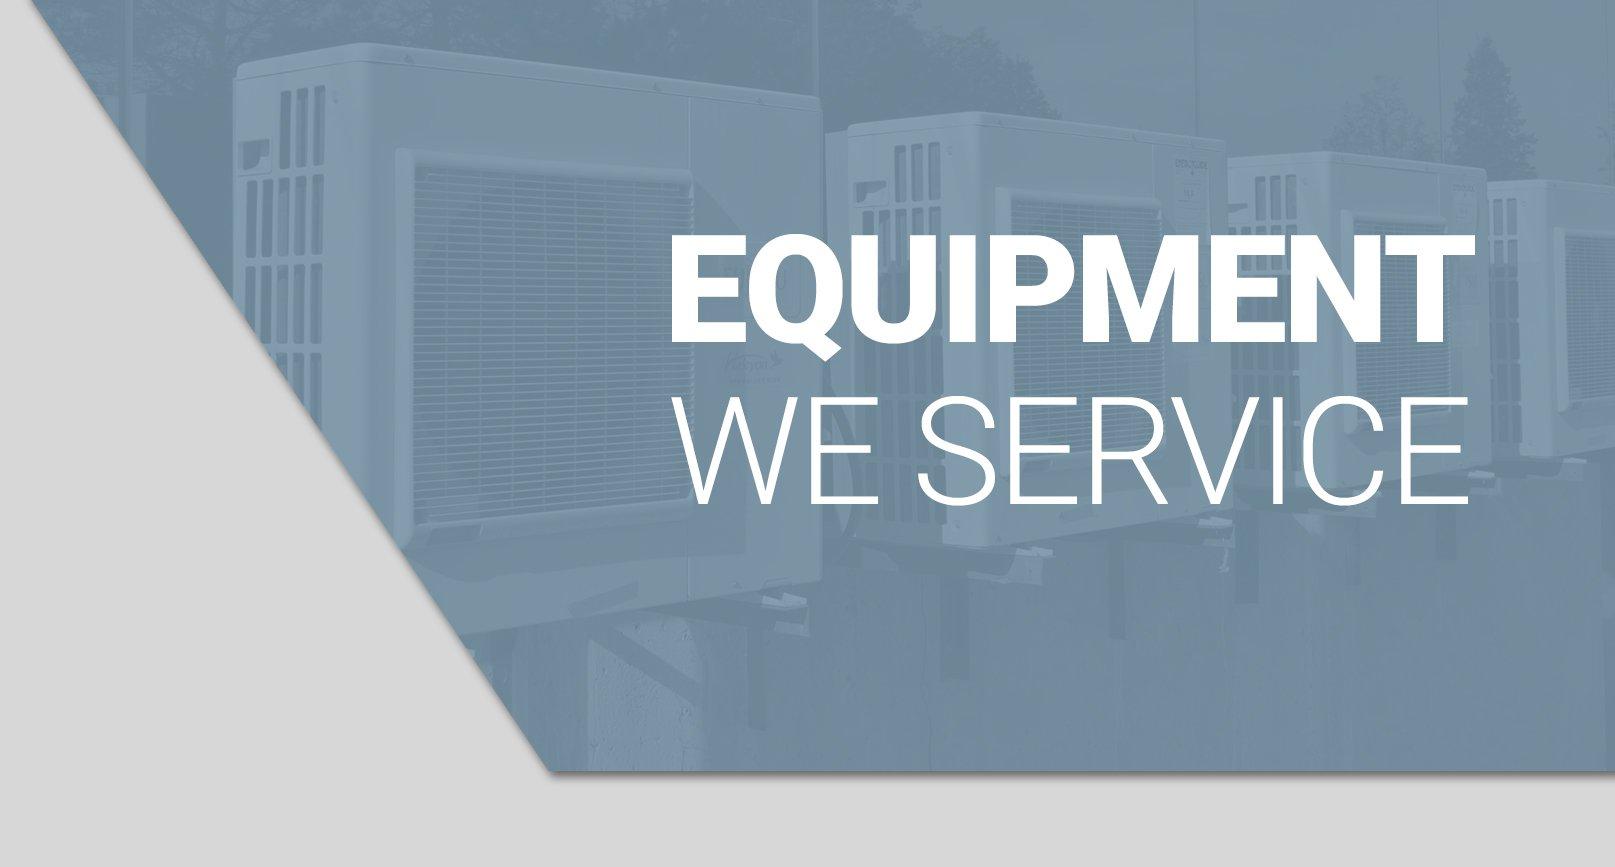 Equipment we service